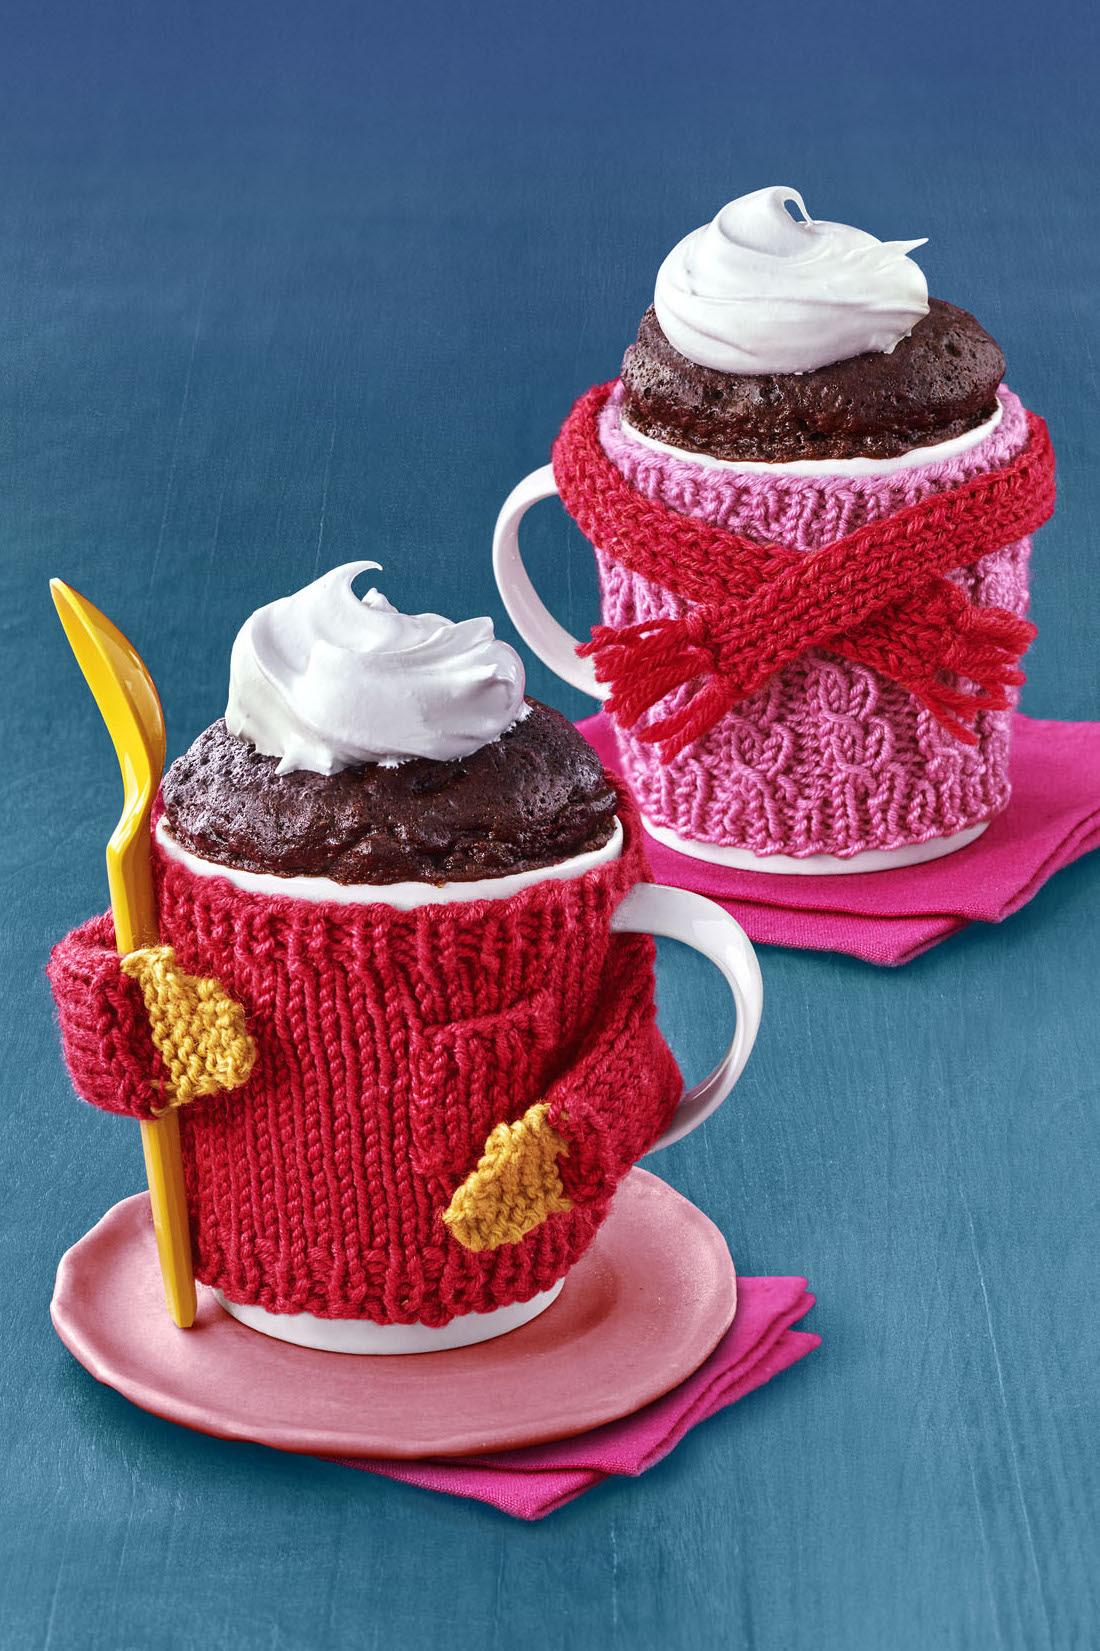 Best Microwave Mug Cake Recipe - How to Make Microwave Mug ...